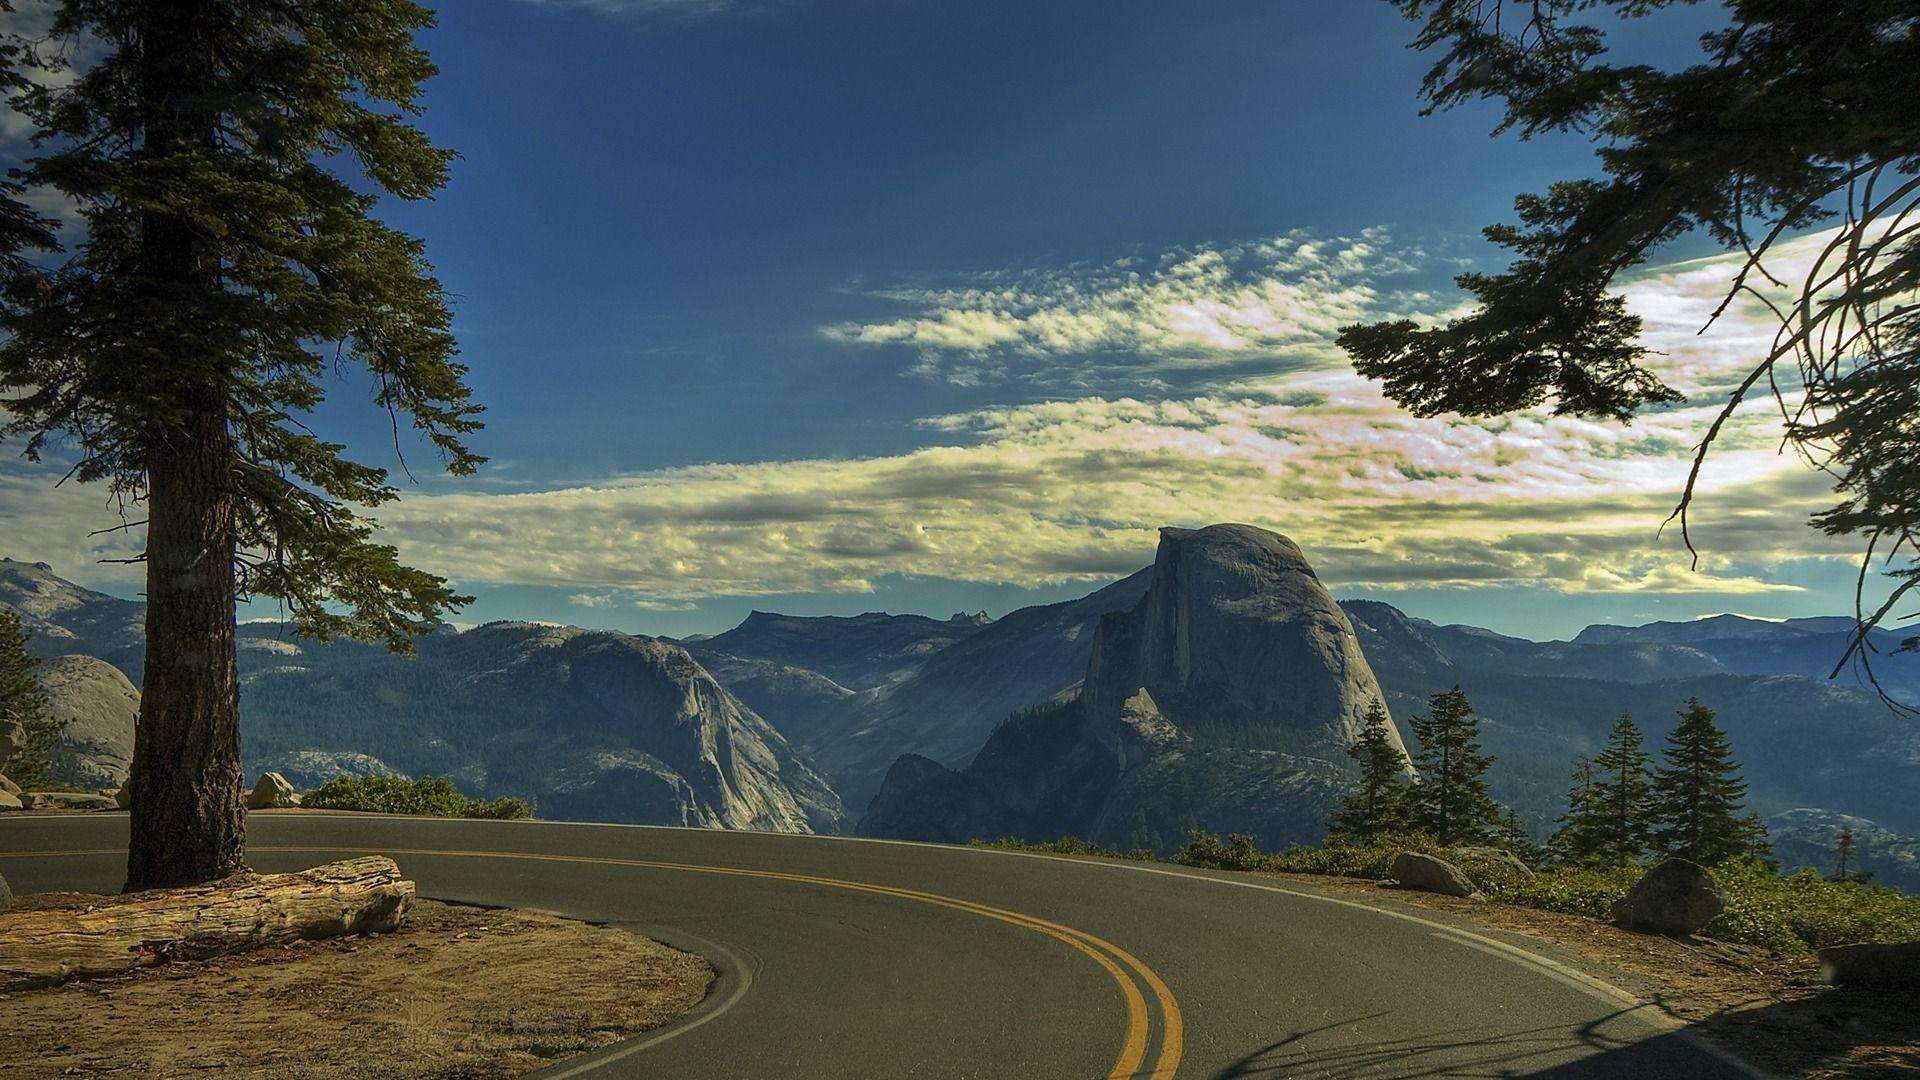 Tremendous Road Turn View 1920 1080 Beautiful Roads National Parks Yosemite Wallpaper Hd wallpaper road turn trees mountain